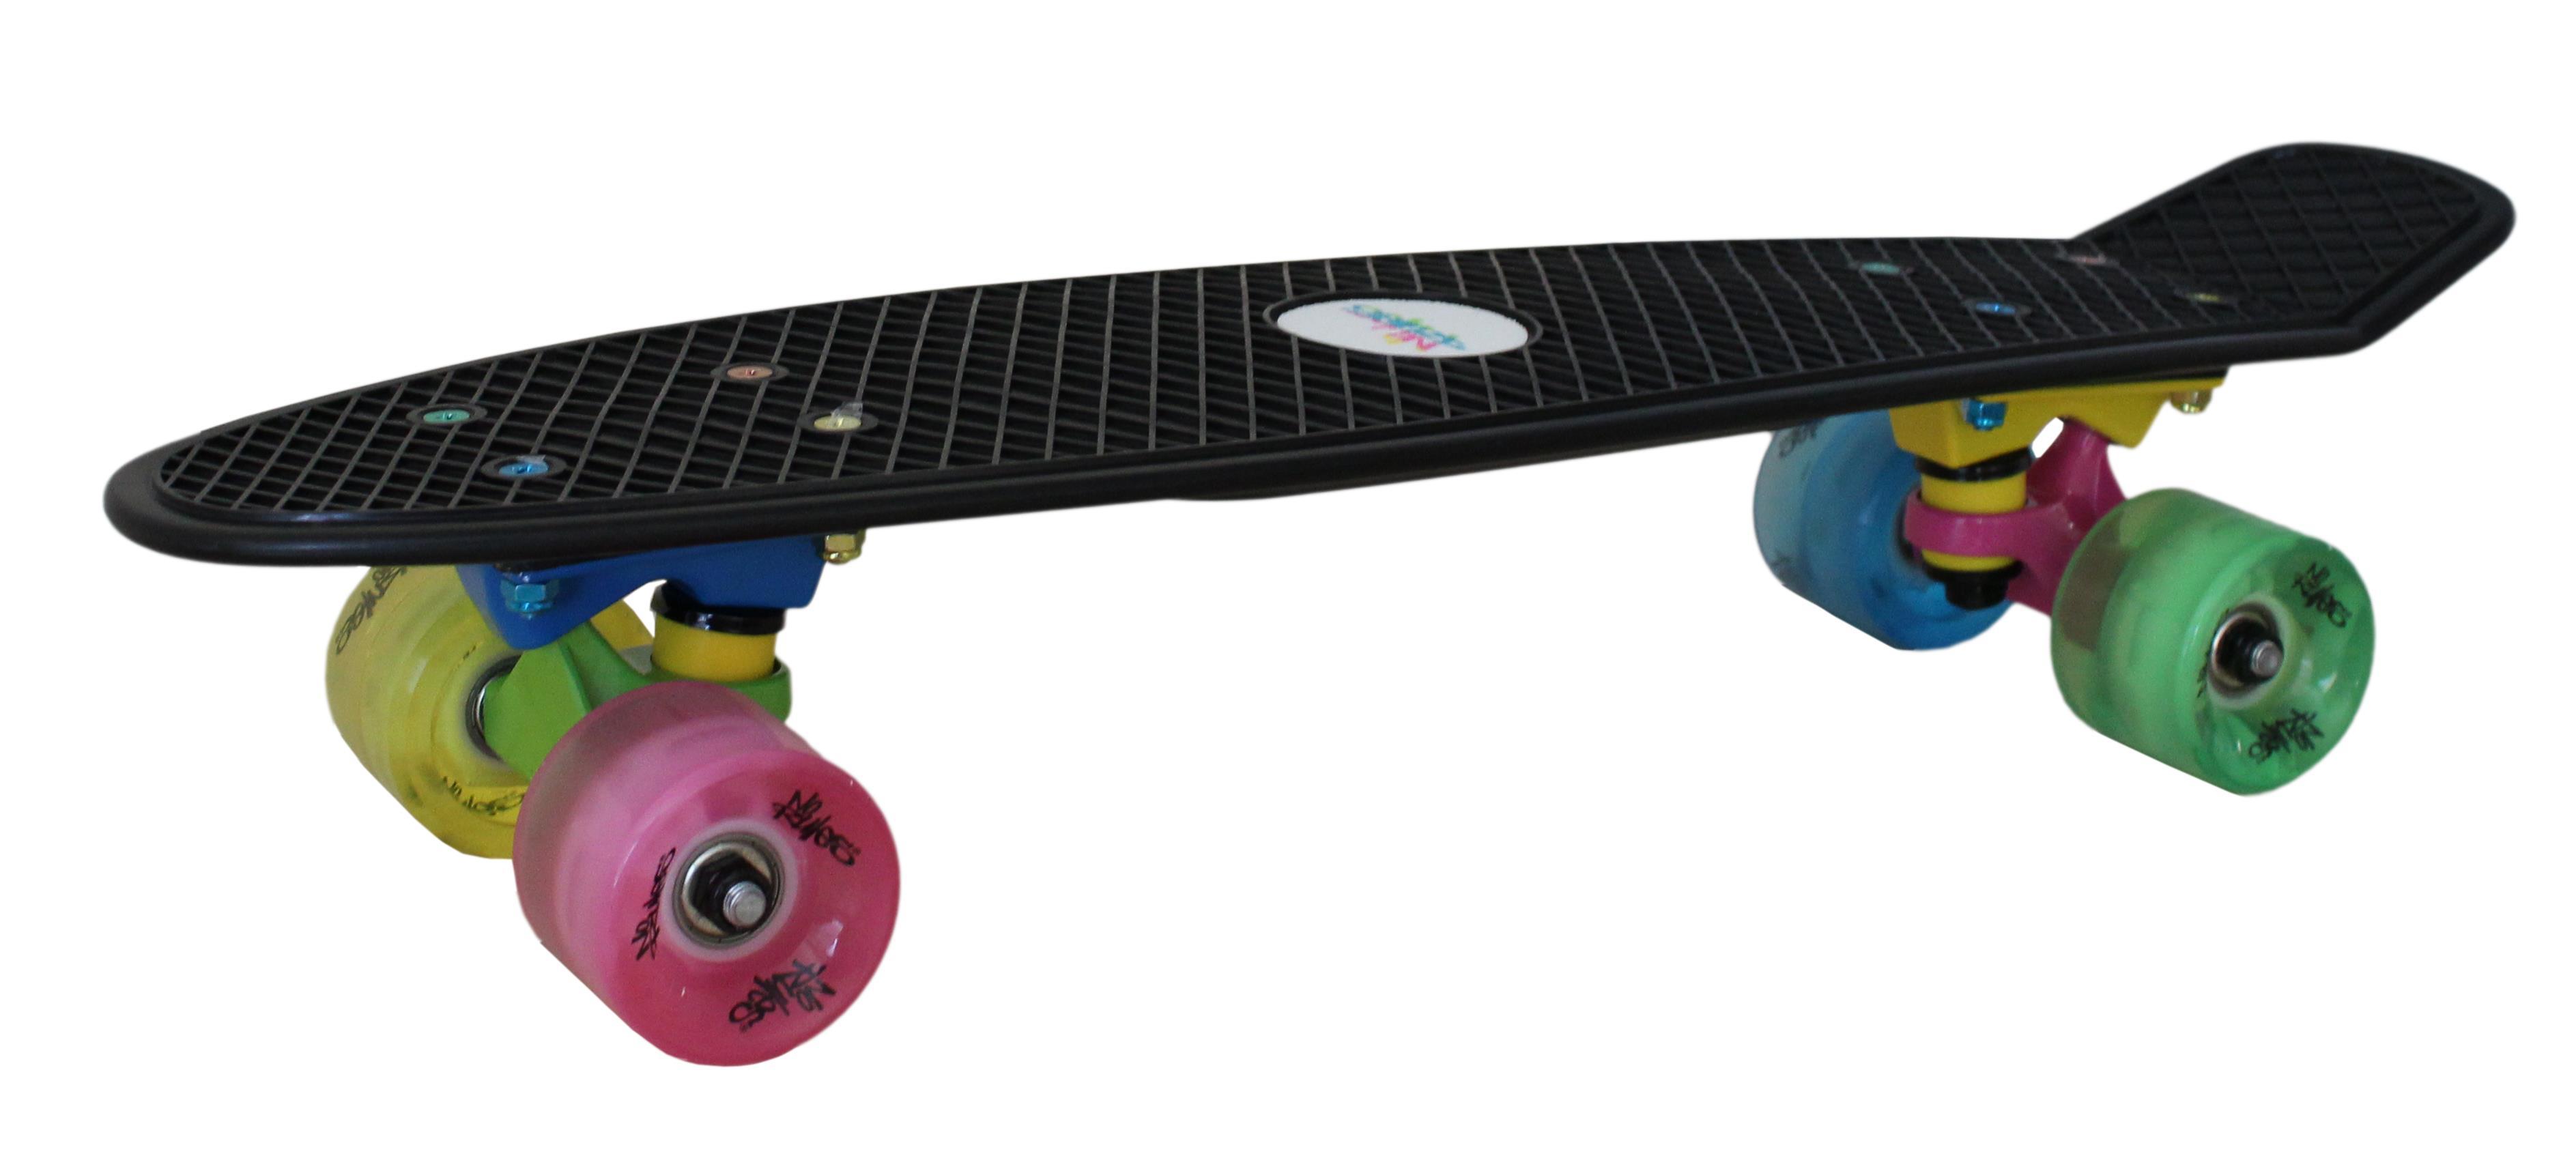 No Rules Skateboard fun NEON skrituļdēlis ar gaismiņām, melns AU 293 Skrejriteņi